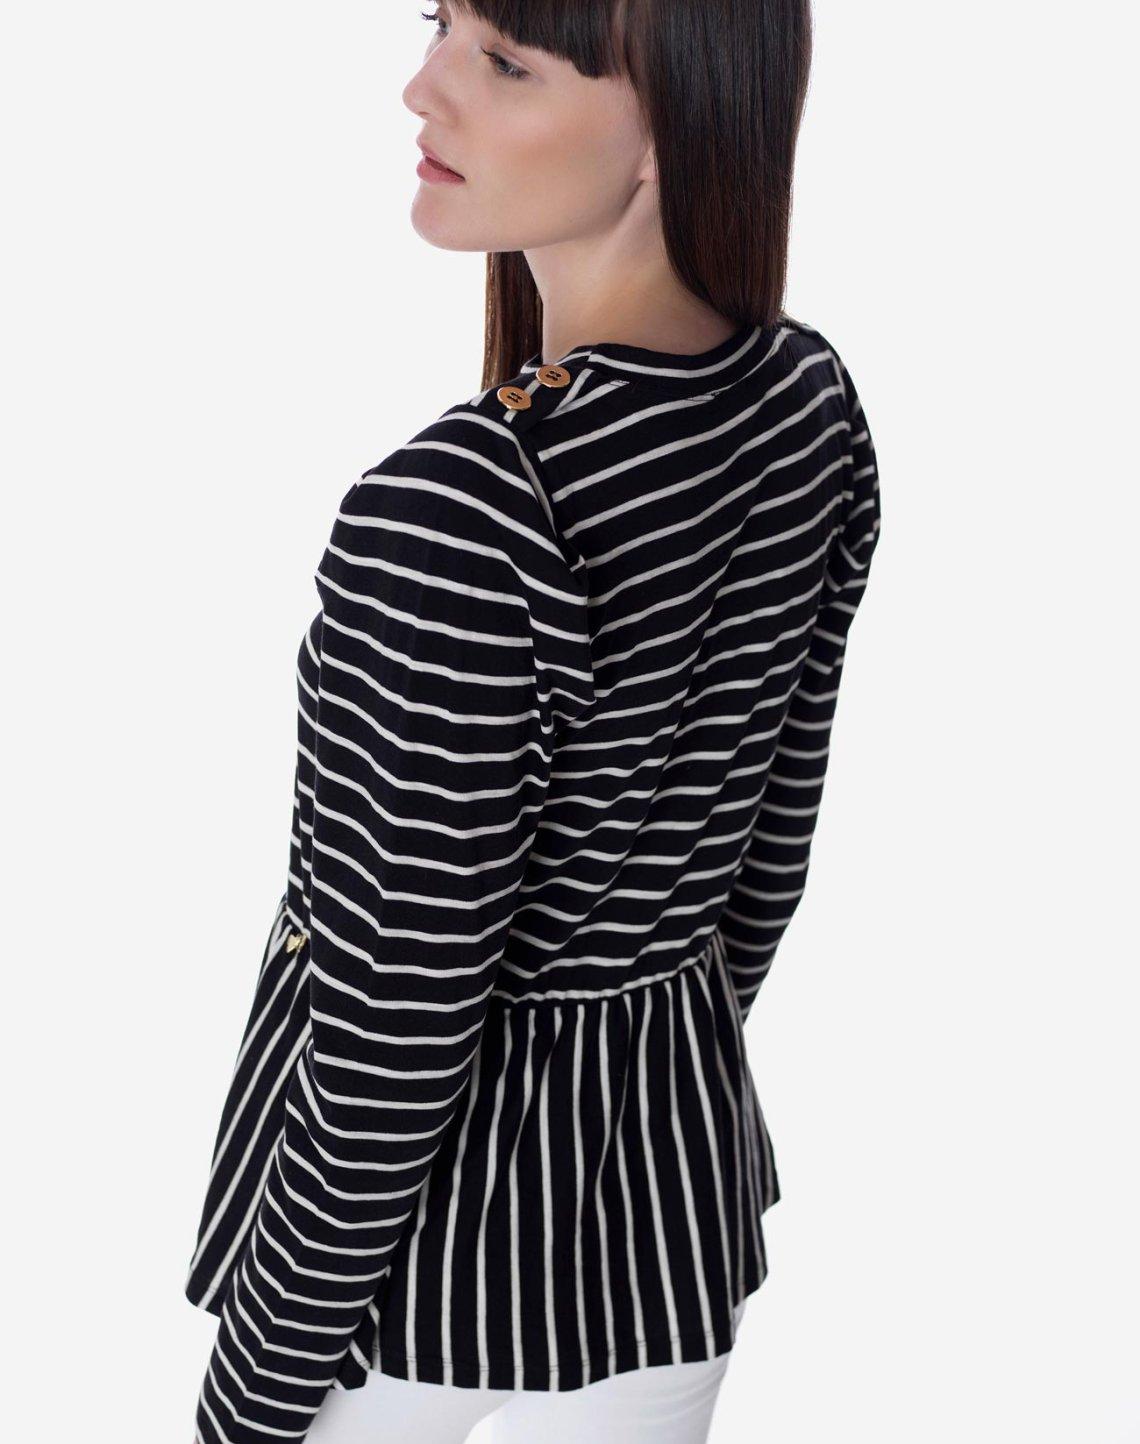 Striped peplum top